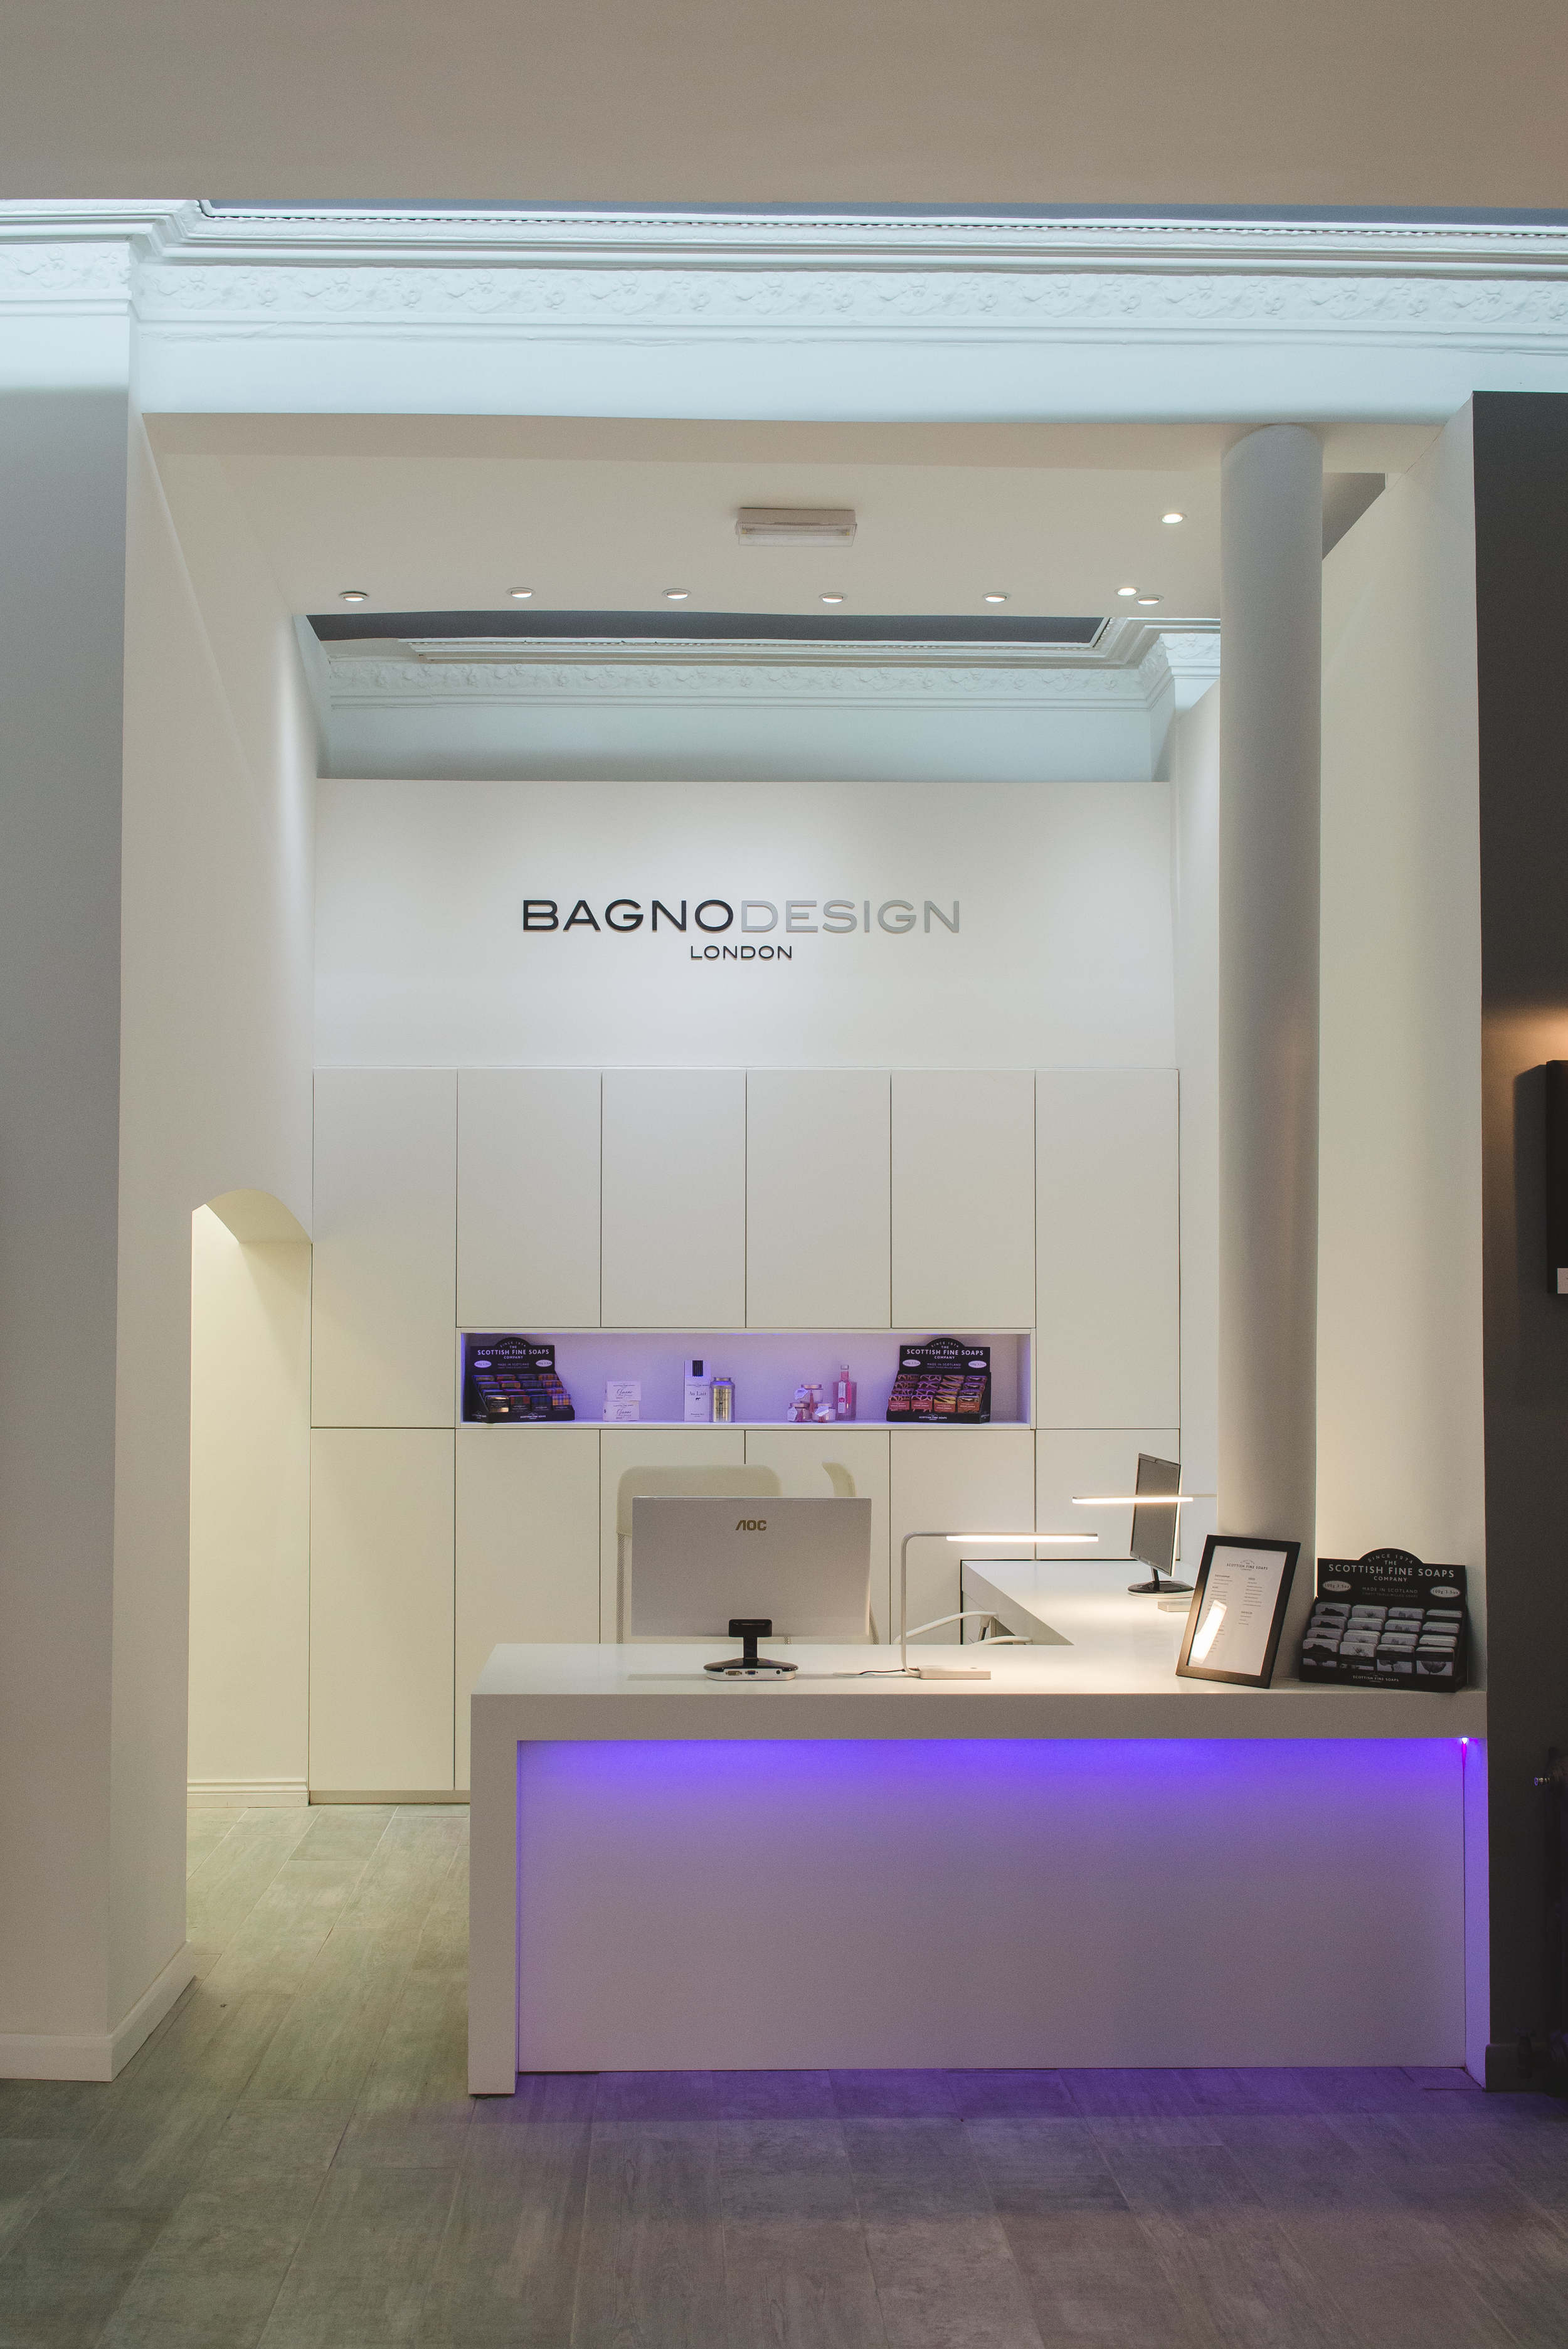 Bagno Glasgow Opening-6.jpg